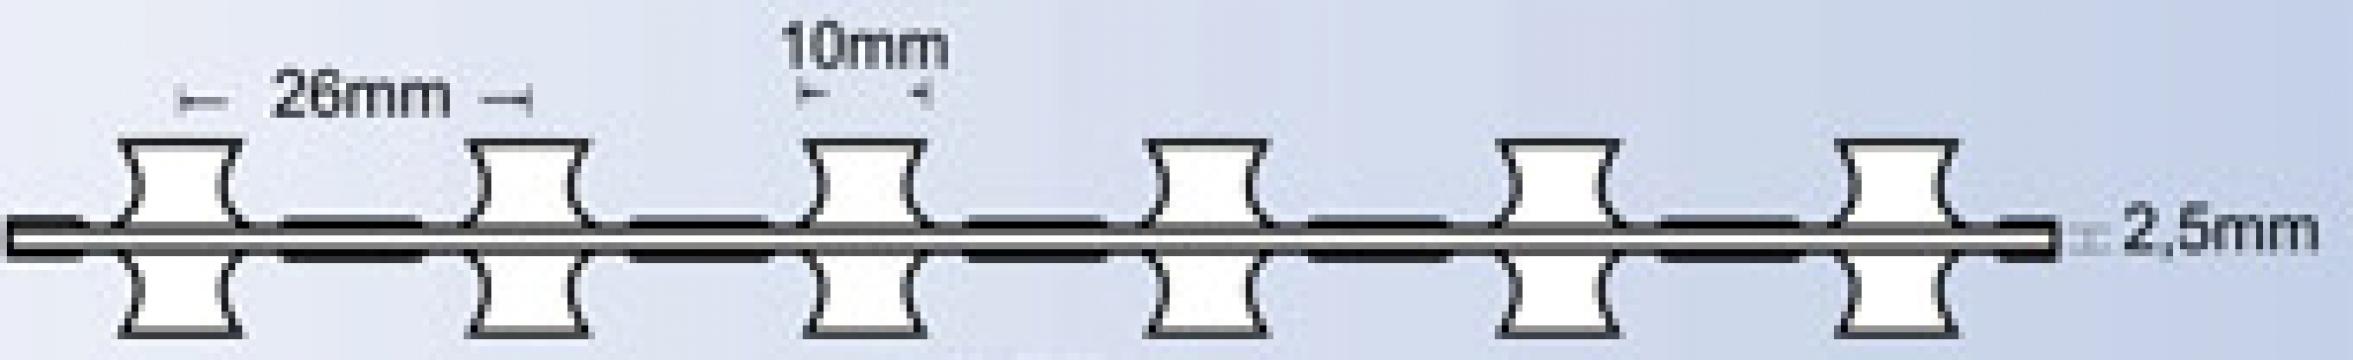 Sarma lamata BTO 10 concertina fara cleme de la S.c. Systema Resources S.r.l.